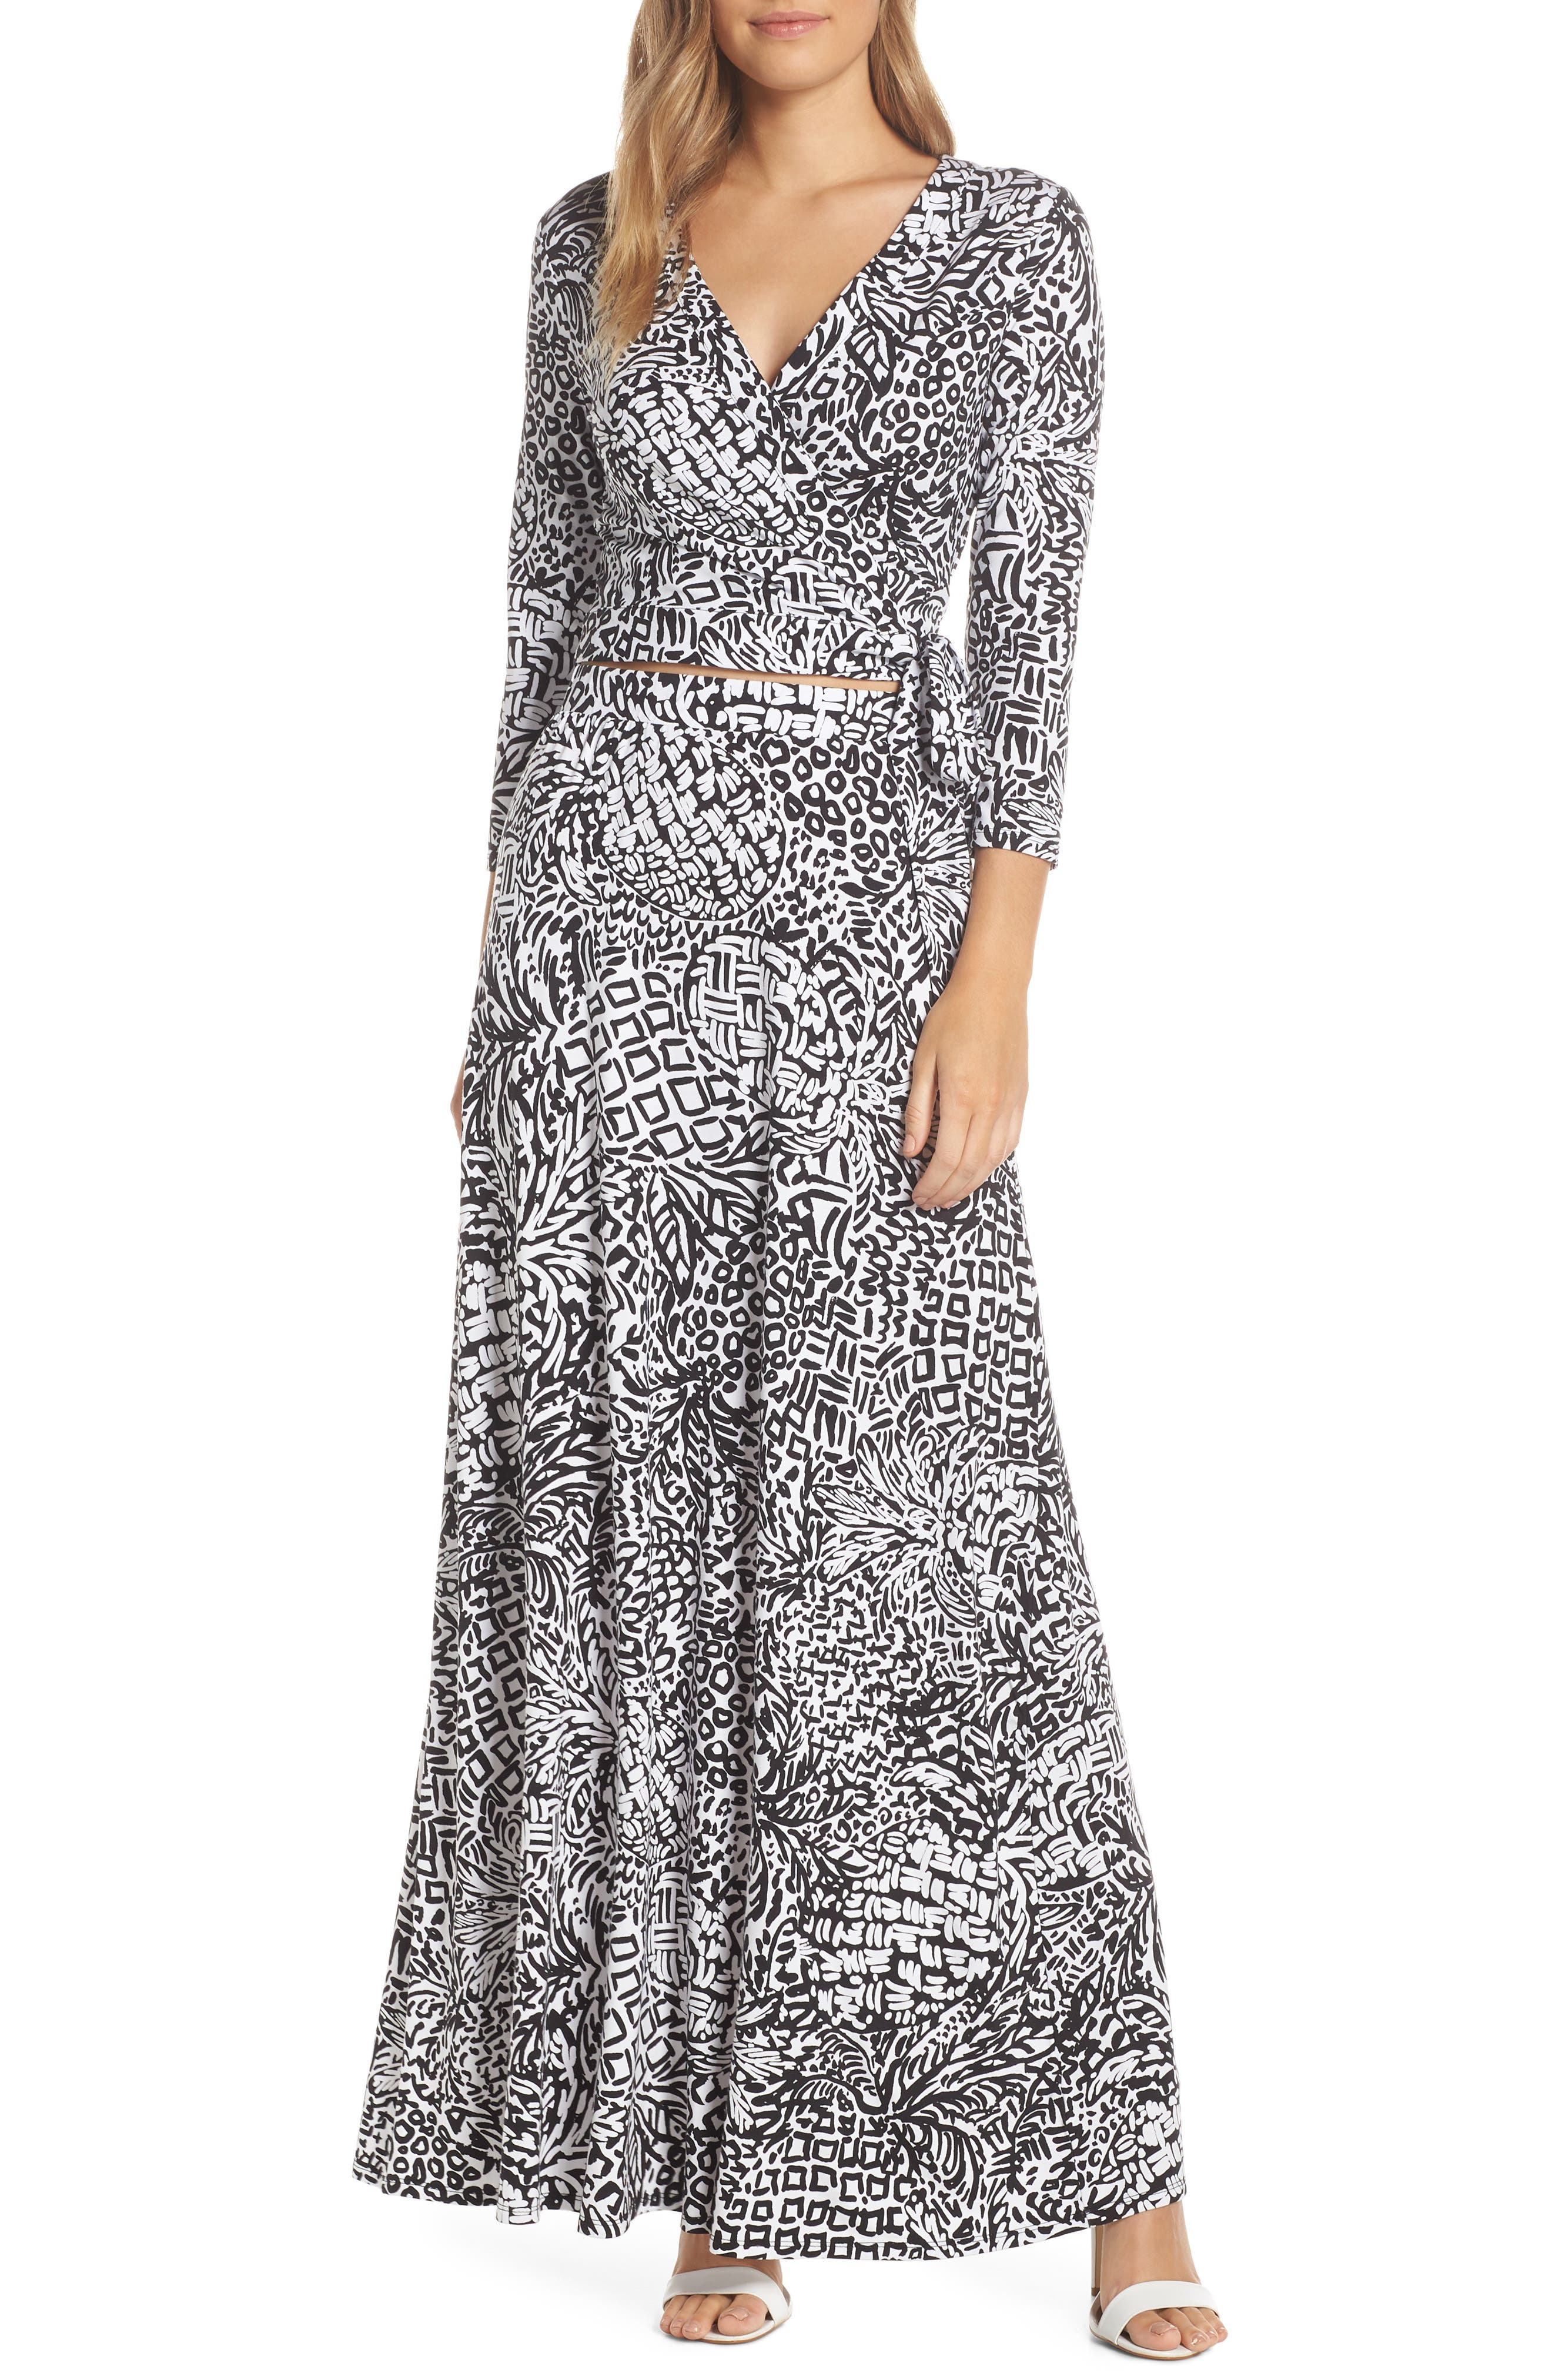 Lilly Pulitzer Ruari Two-Piece Maxi Dress, Black